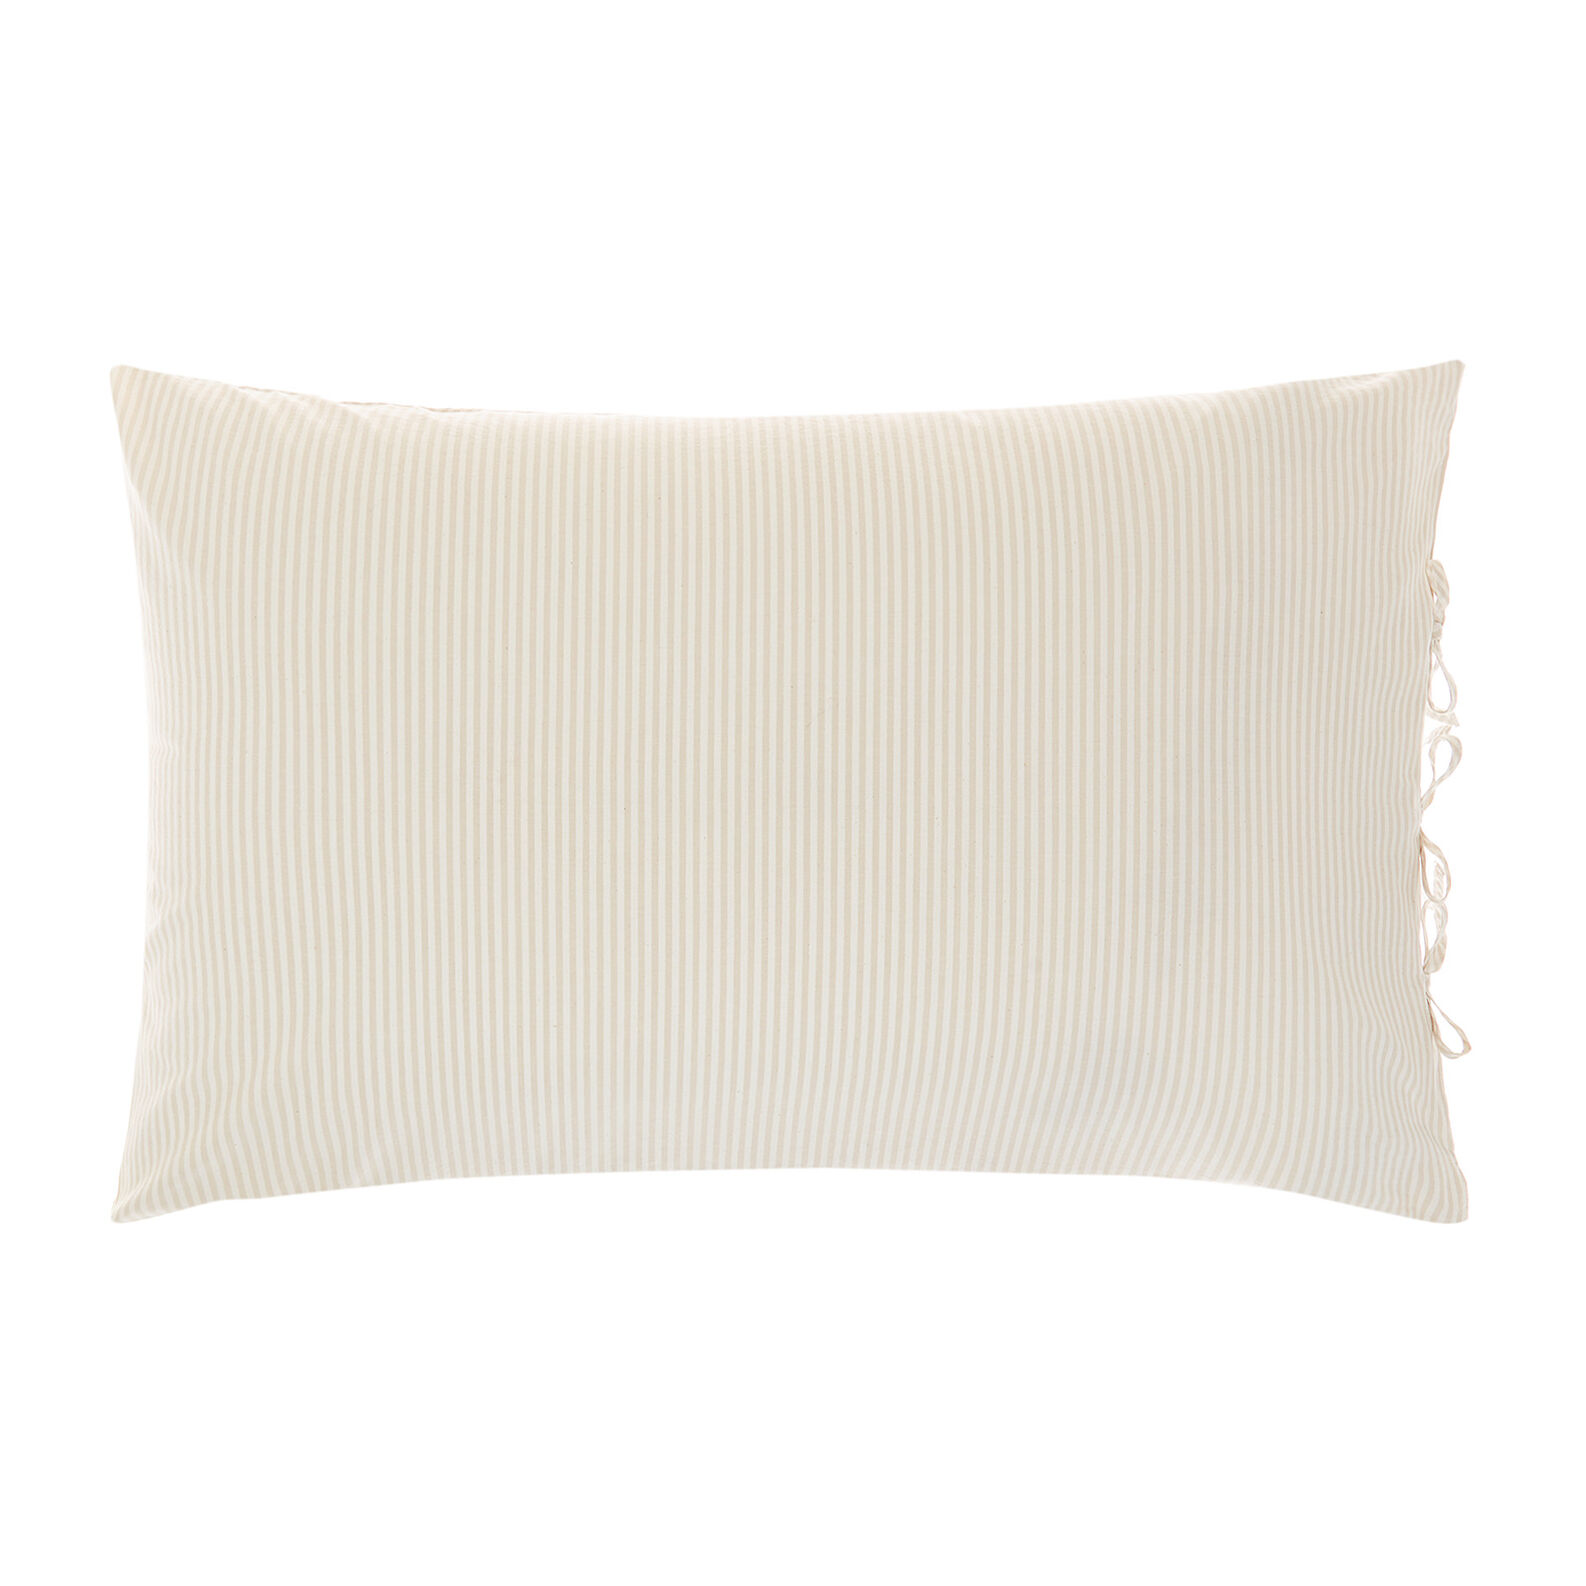 Yarn-dyed striped cotton pillowcase